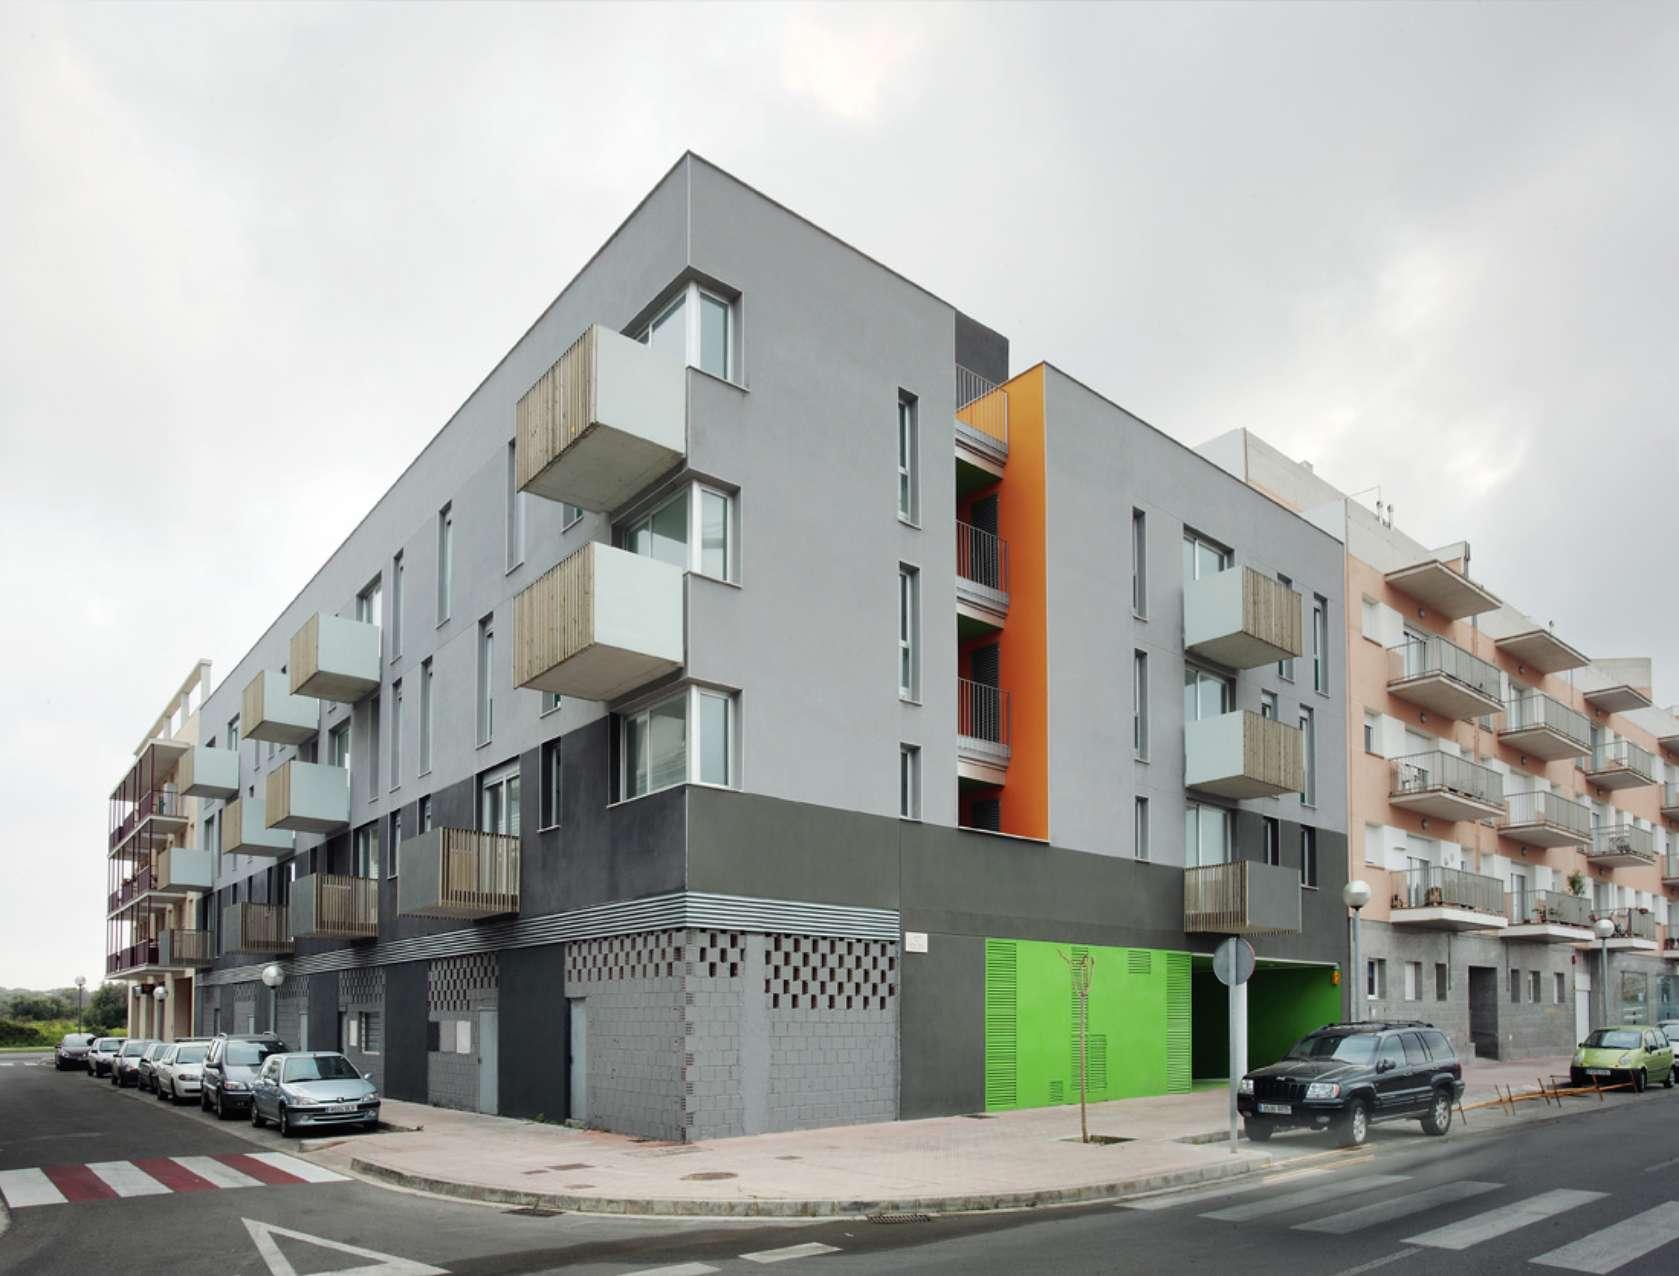 Flexo arquitectura architizer - Flexo arquitectura ...